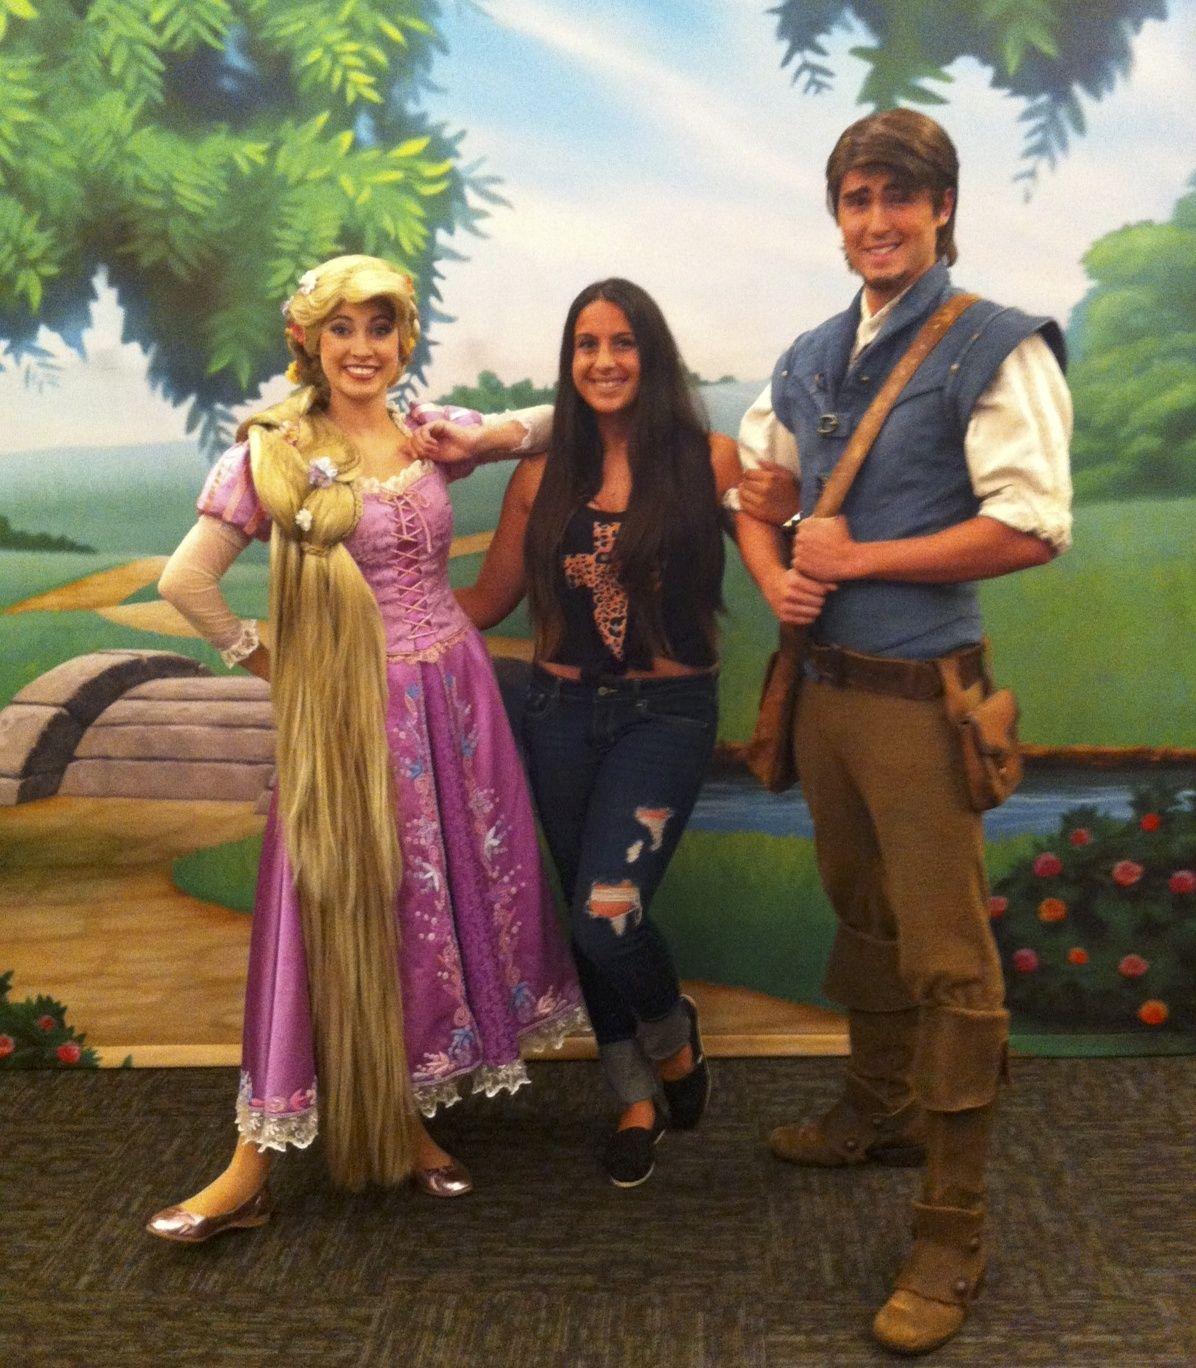 Disney Character Meet And Greets Waltdisneyworld